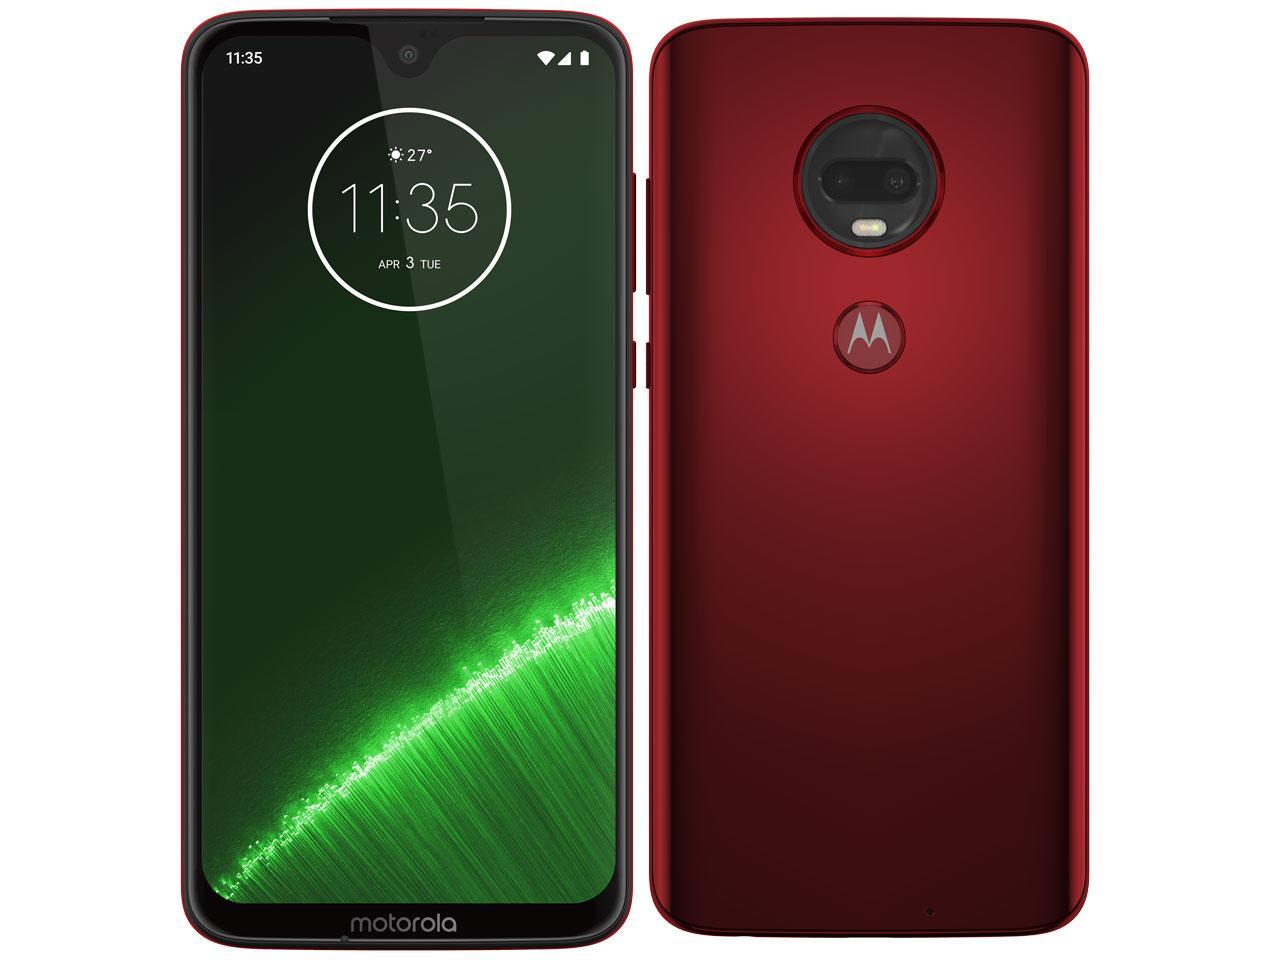 Motorola(モトローラ) スマートフォン Moto G7+ ビバレッド(PADU0002JP)【smtb-s】